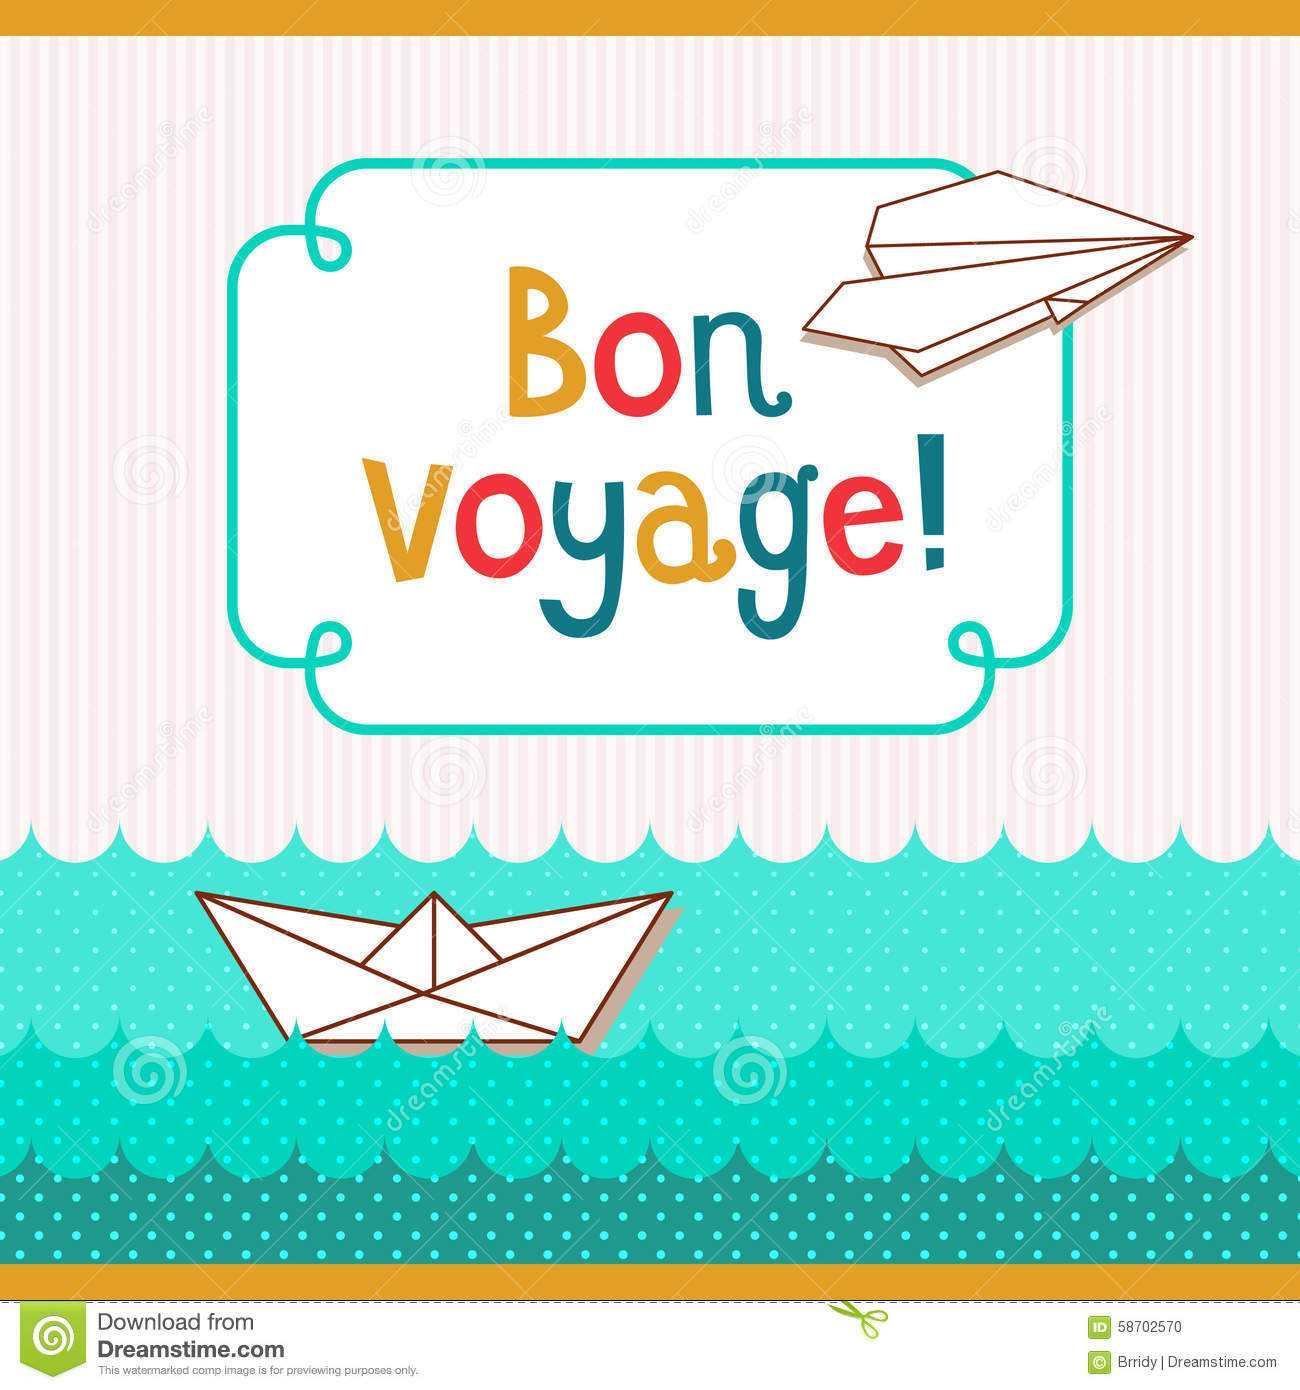 Bon Voyage Card Illustration 58702570 - Megapixl inside Bon Voyage Card Template